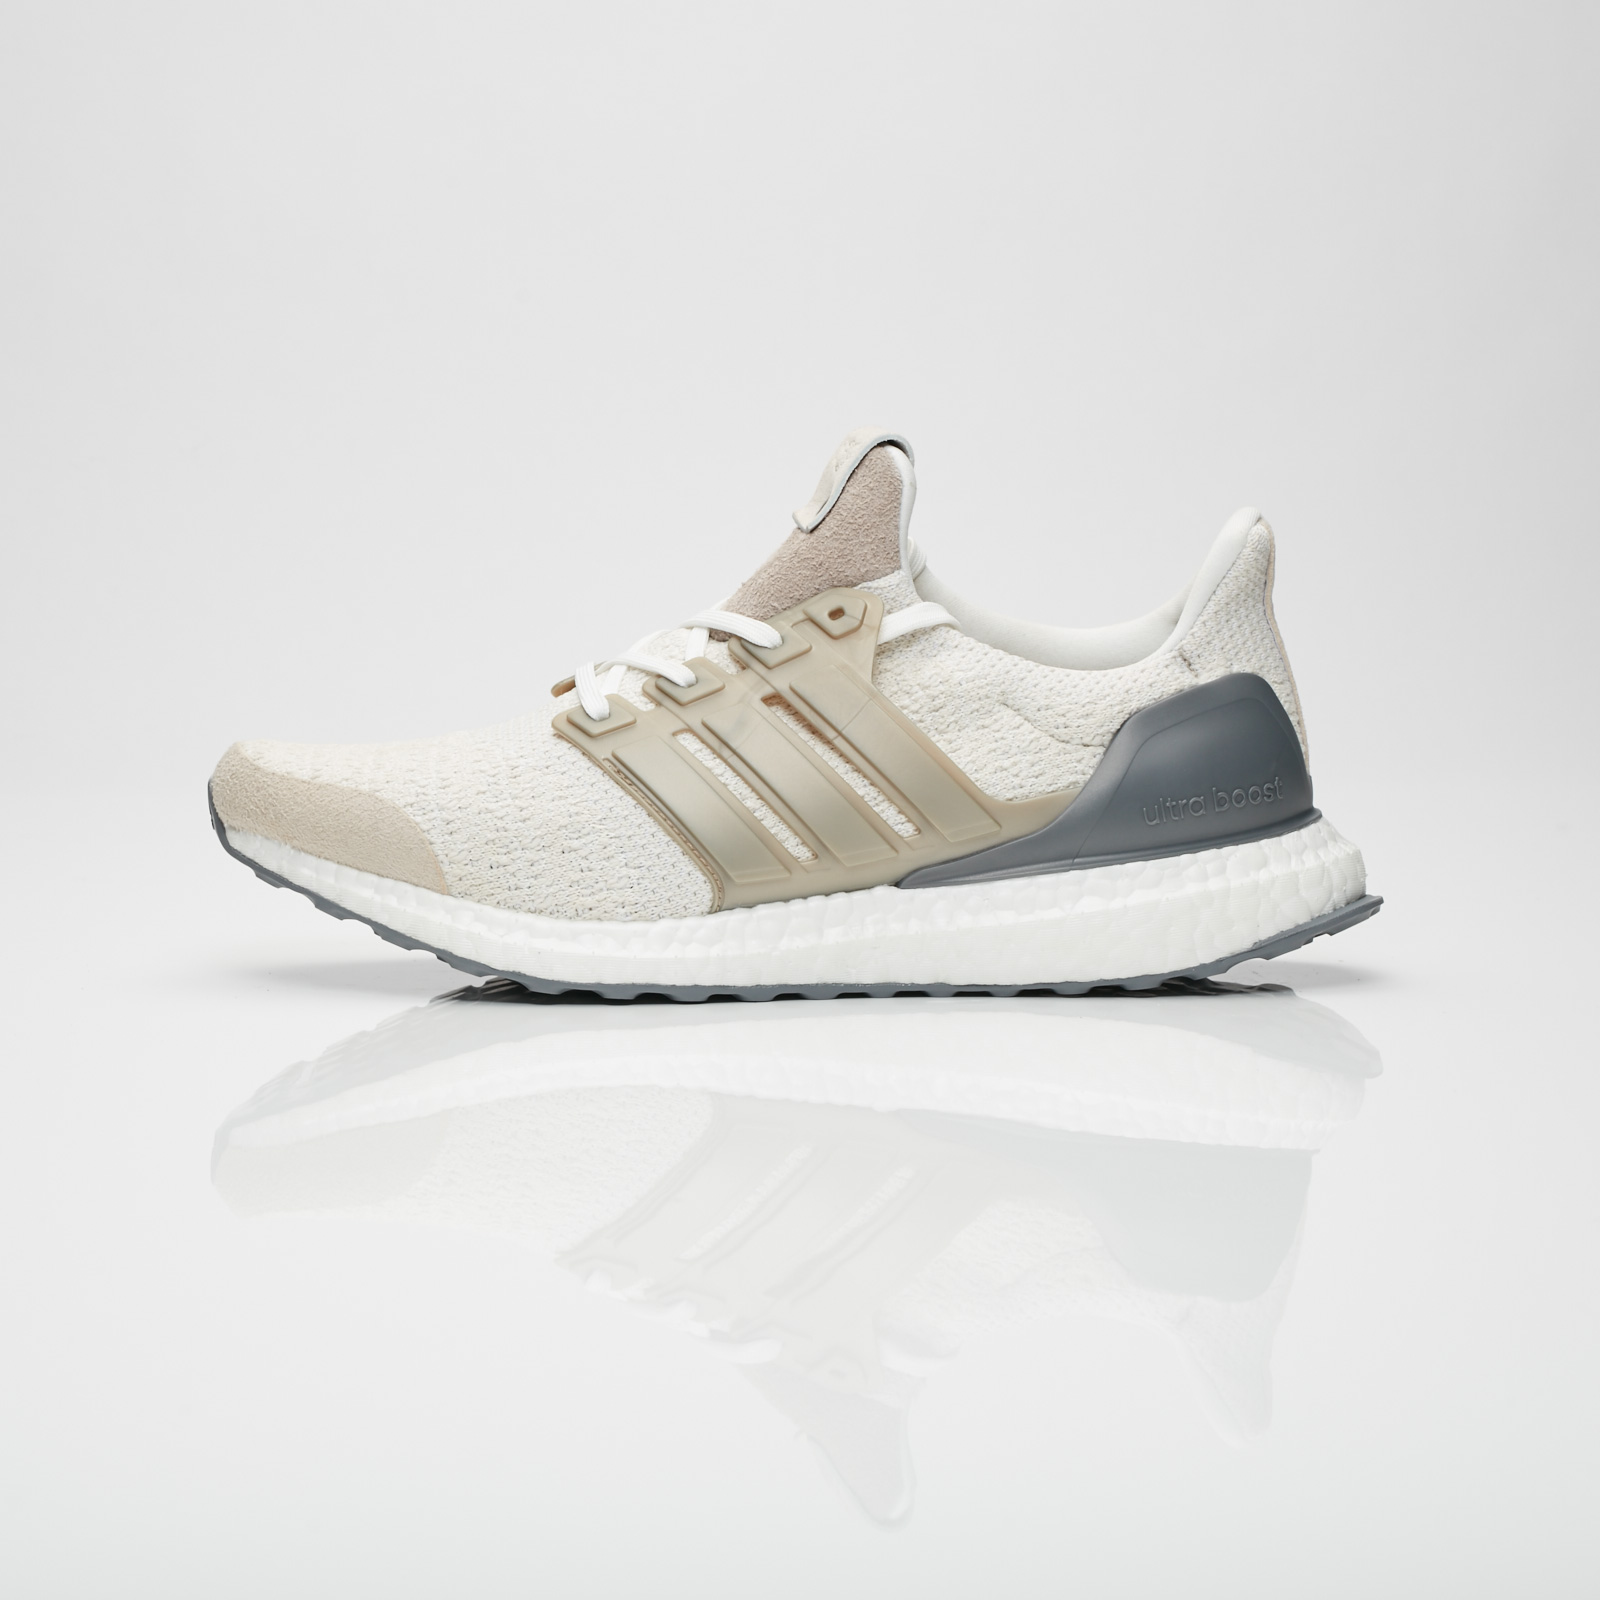 sneakersnstuff social status adidas consortium ultra boost lux 2